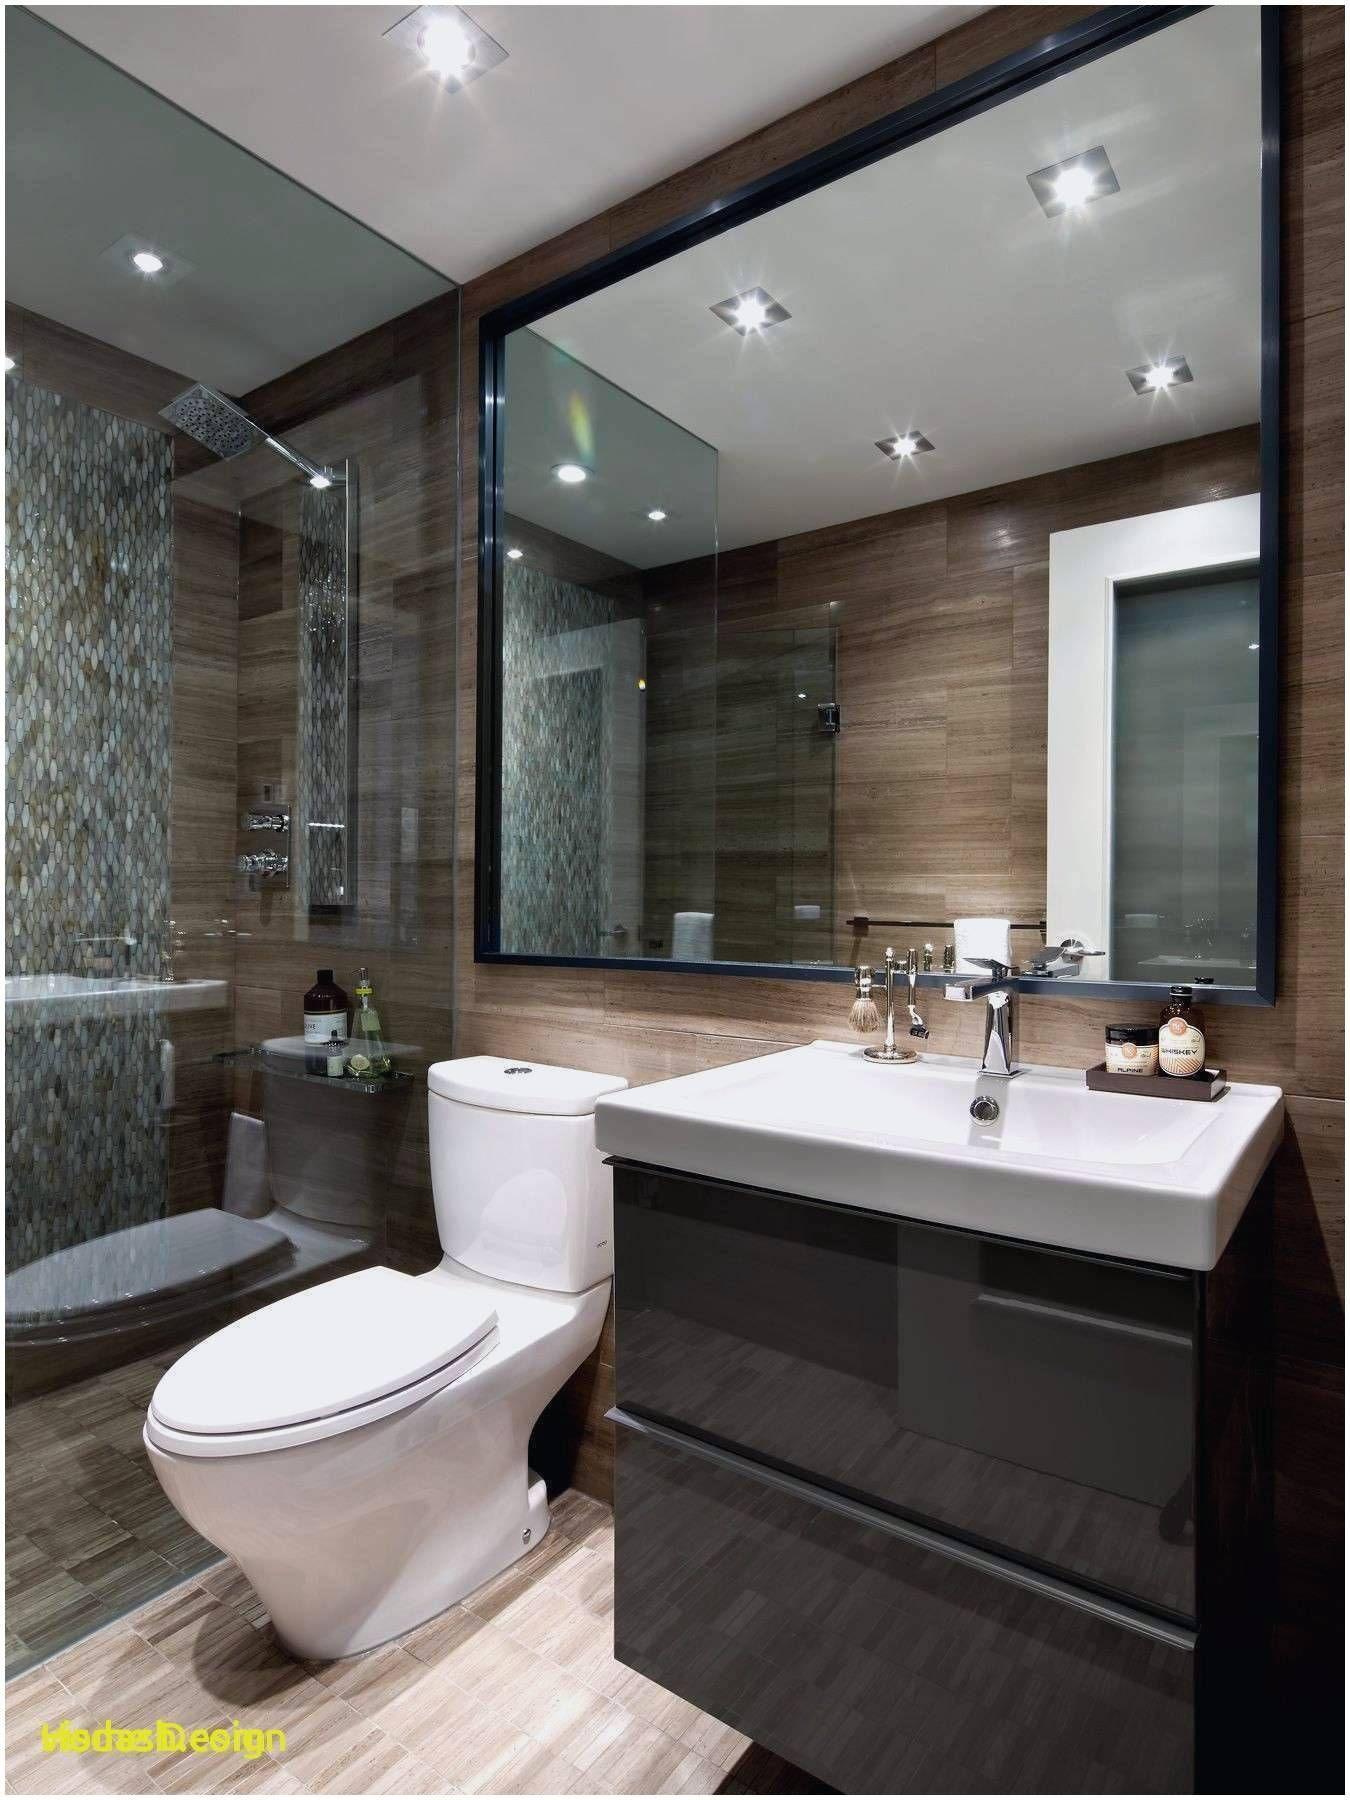 Inspirational Elegant Bathroom Layout Ideas 9 X 7 Home Design For Choice 5 7 Bathroom Floor Plan Tedxv Condo Bathroom Elegant Bathroom Small Bathroom Remodel